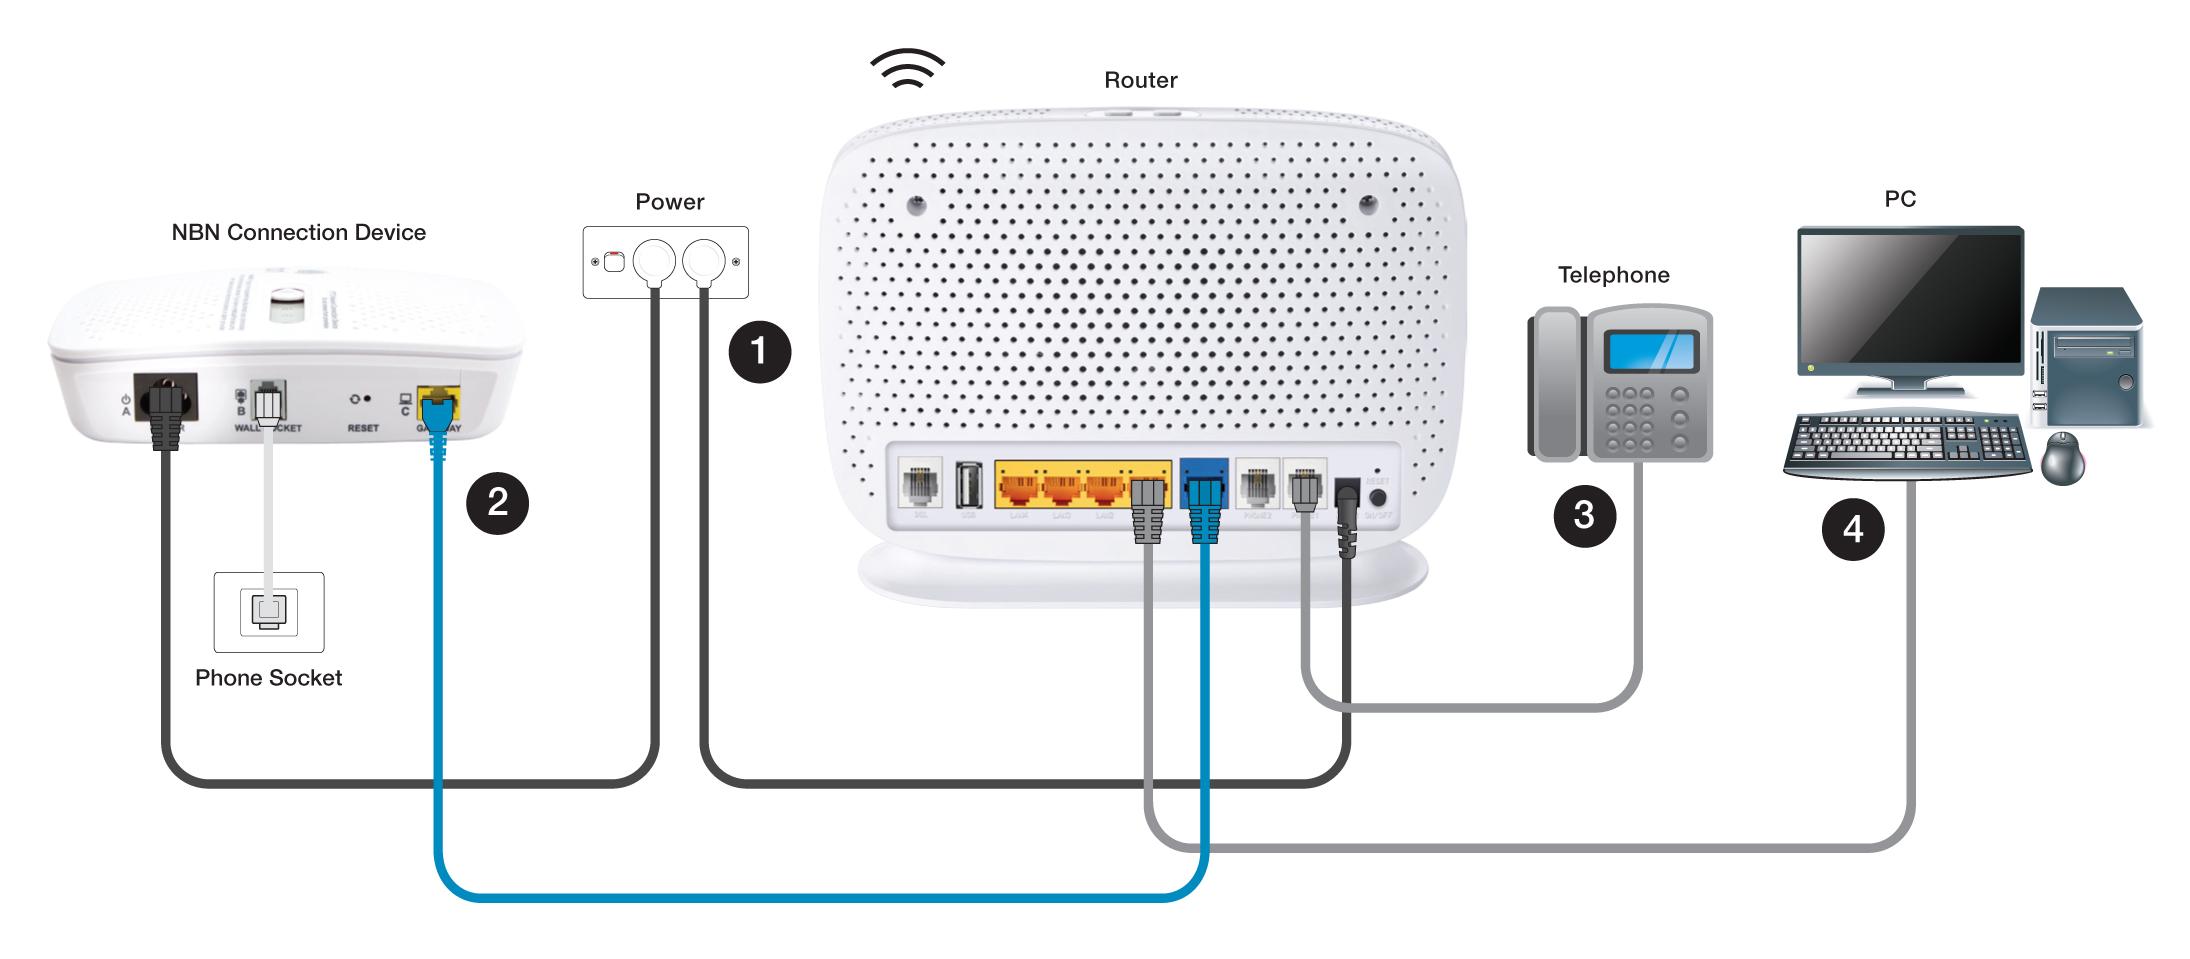 fttc wiring diagram